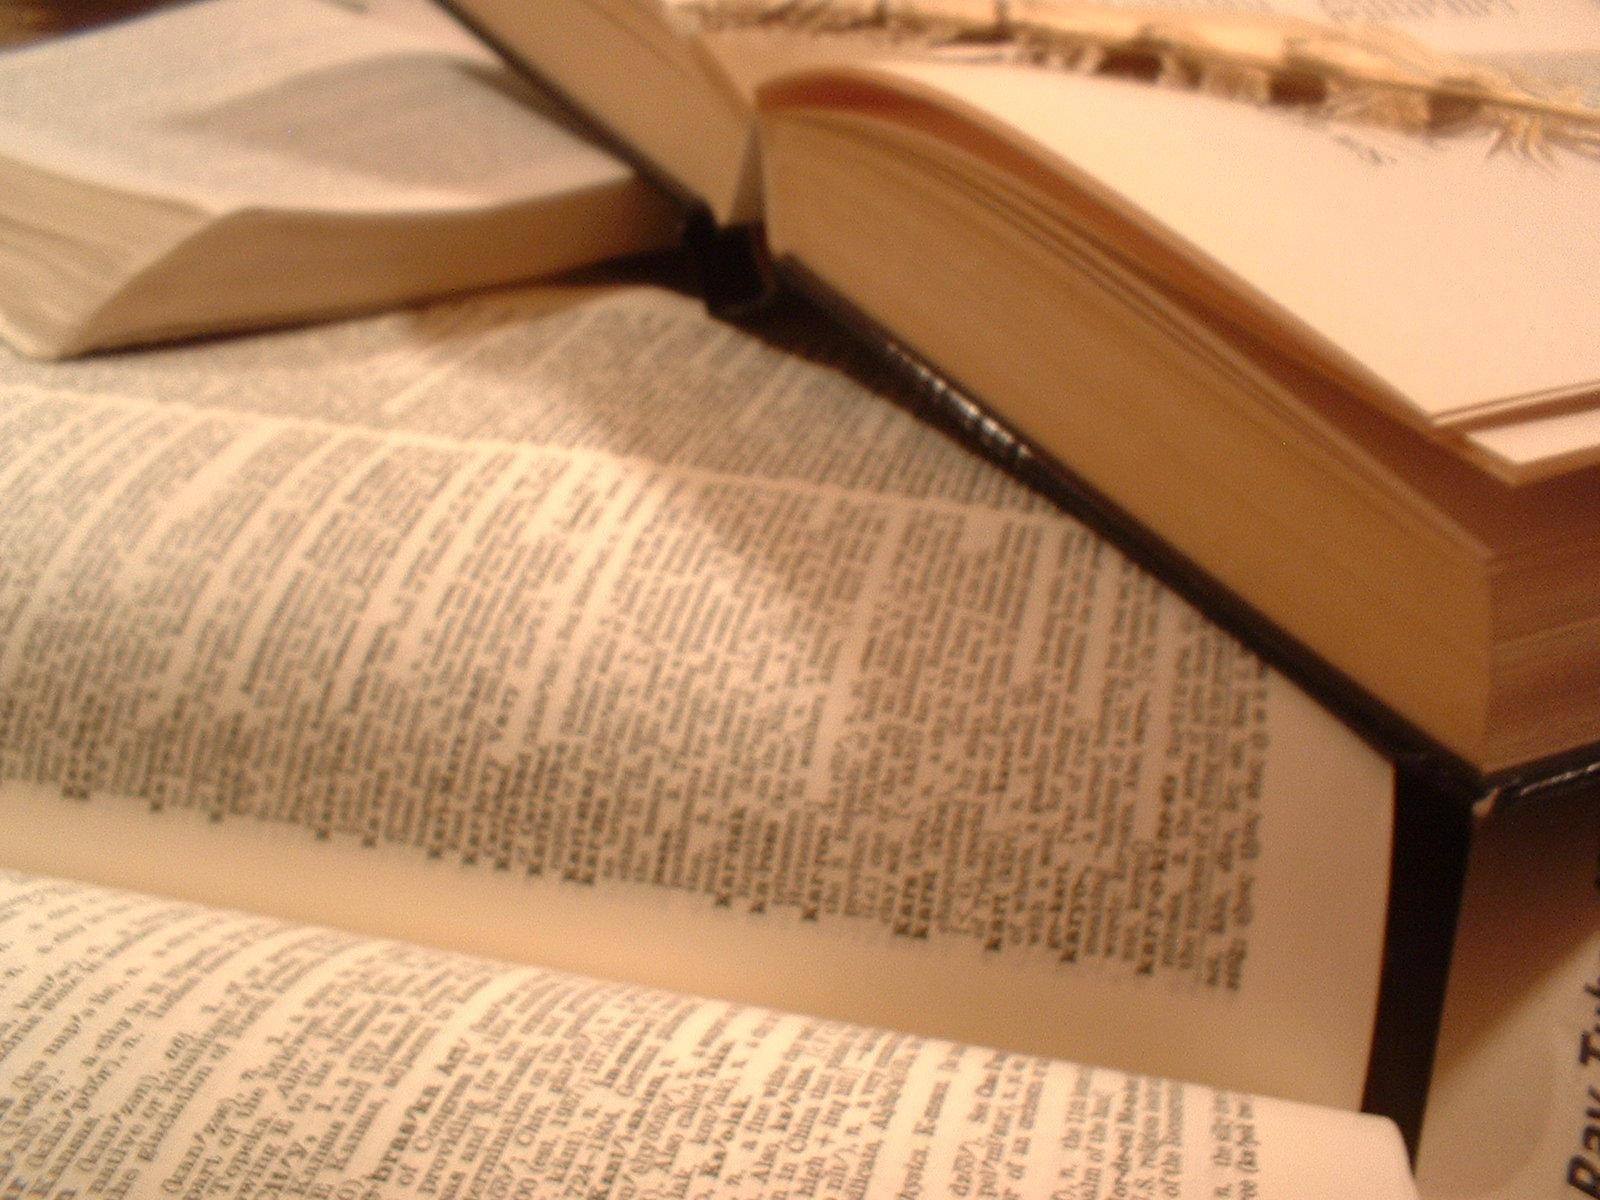 Books by redbanana